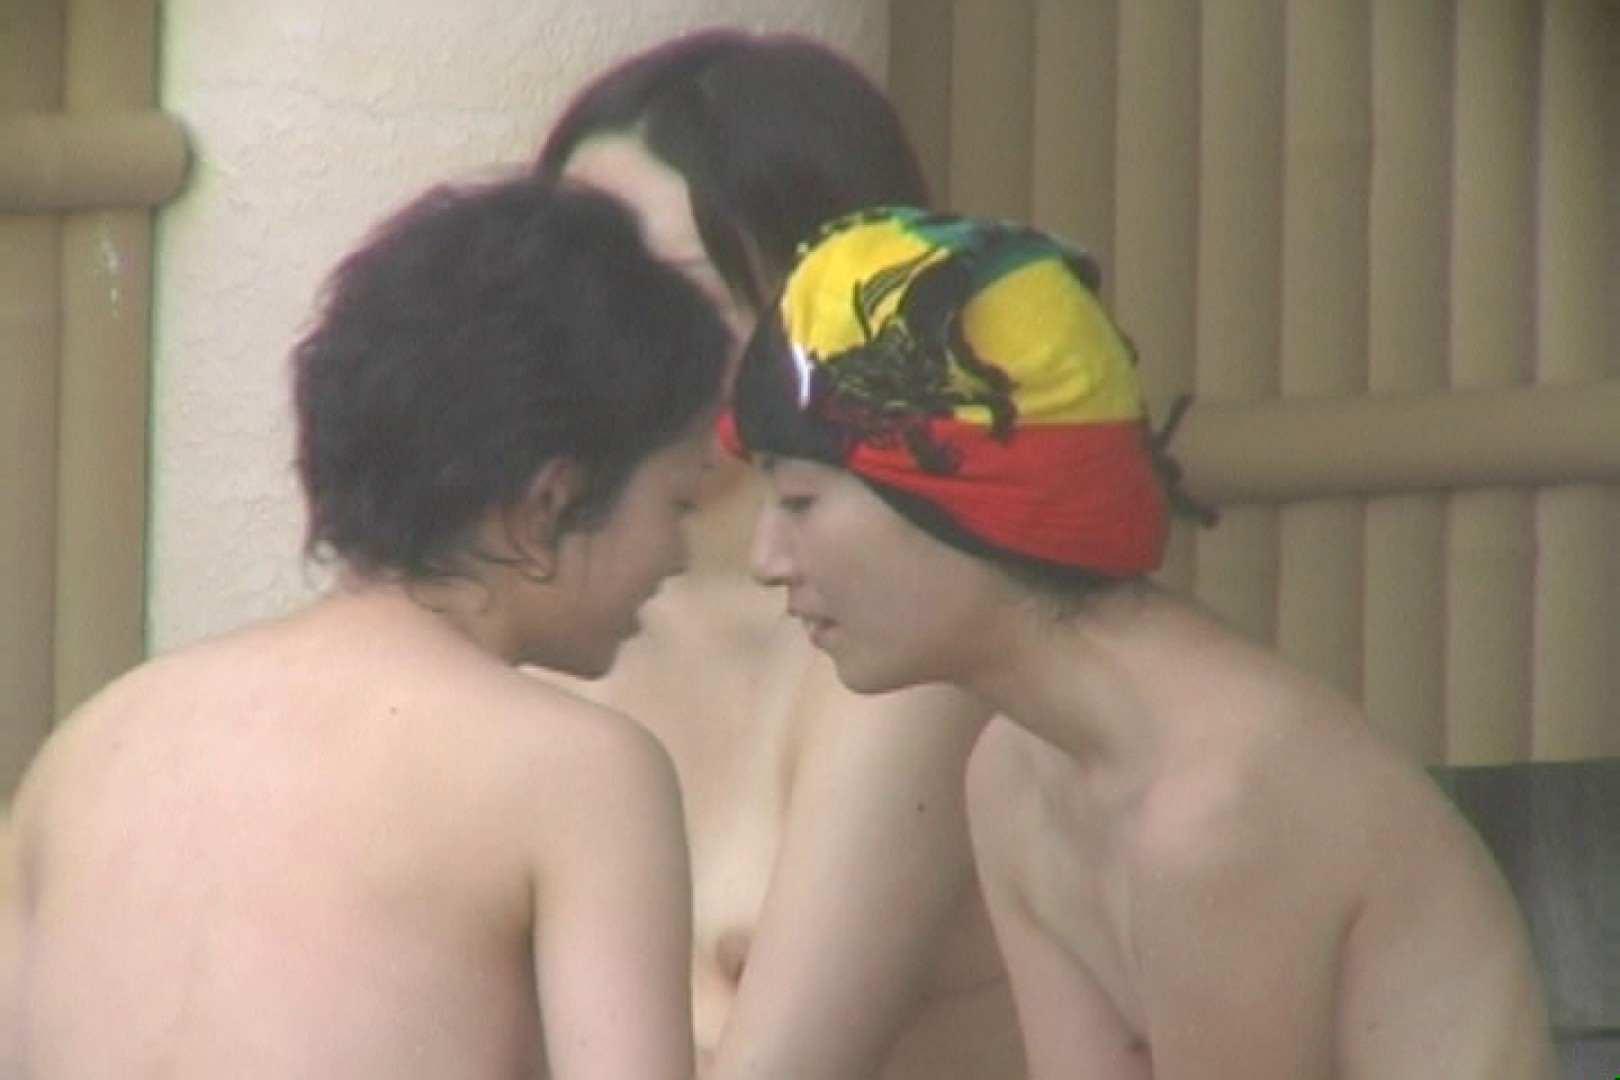 Aquaな露天風呂Vol.61【VIP限定】 OLセックス   盗撮  72画像 13